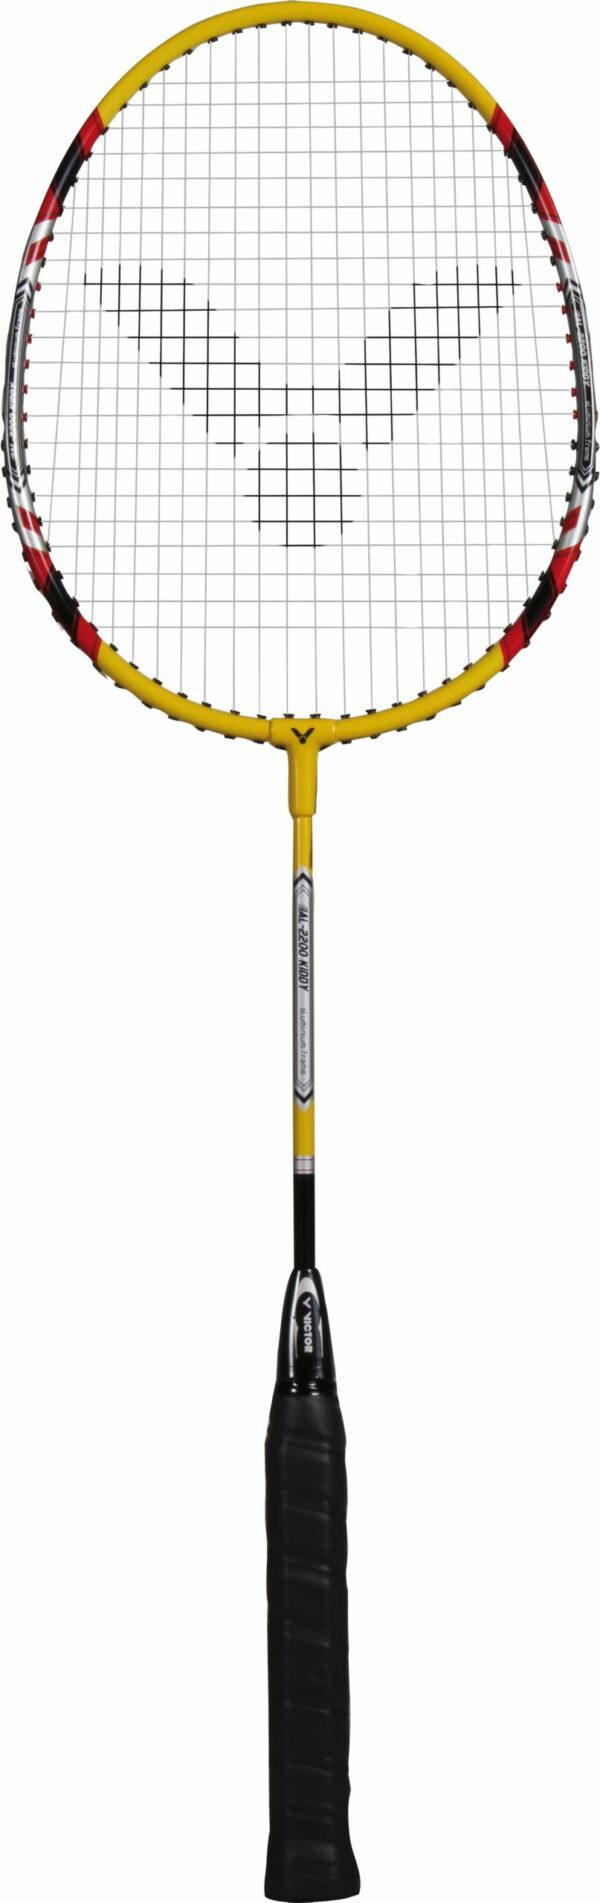 Badminton-Schläger VICTOR AL-2200 KIDDY